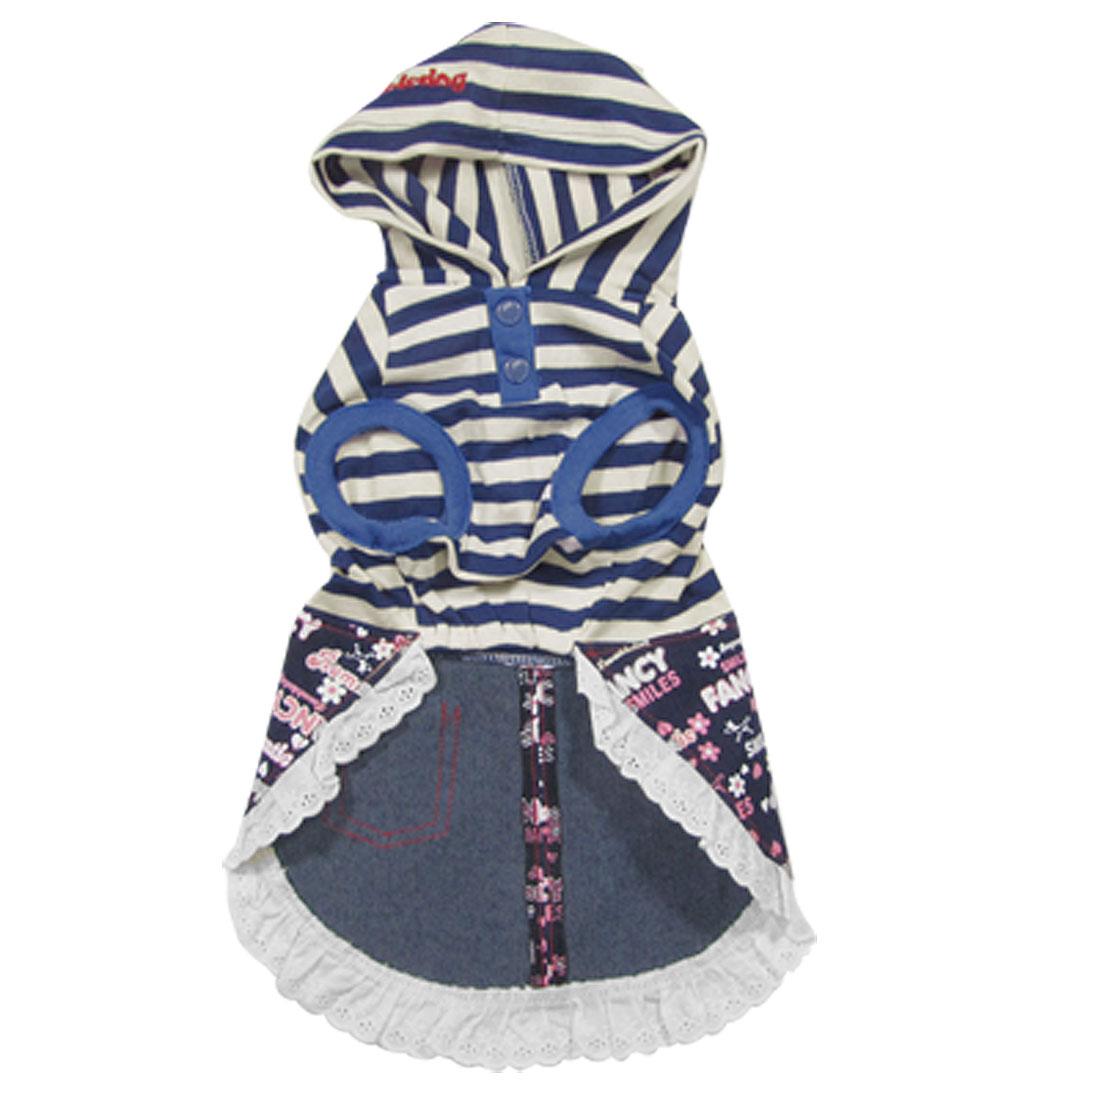 Blue Stripes Pet Dog Apparel Hooded Shirts Skirts Dress Lace Hem Size L